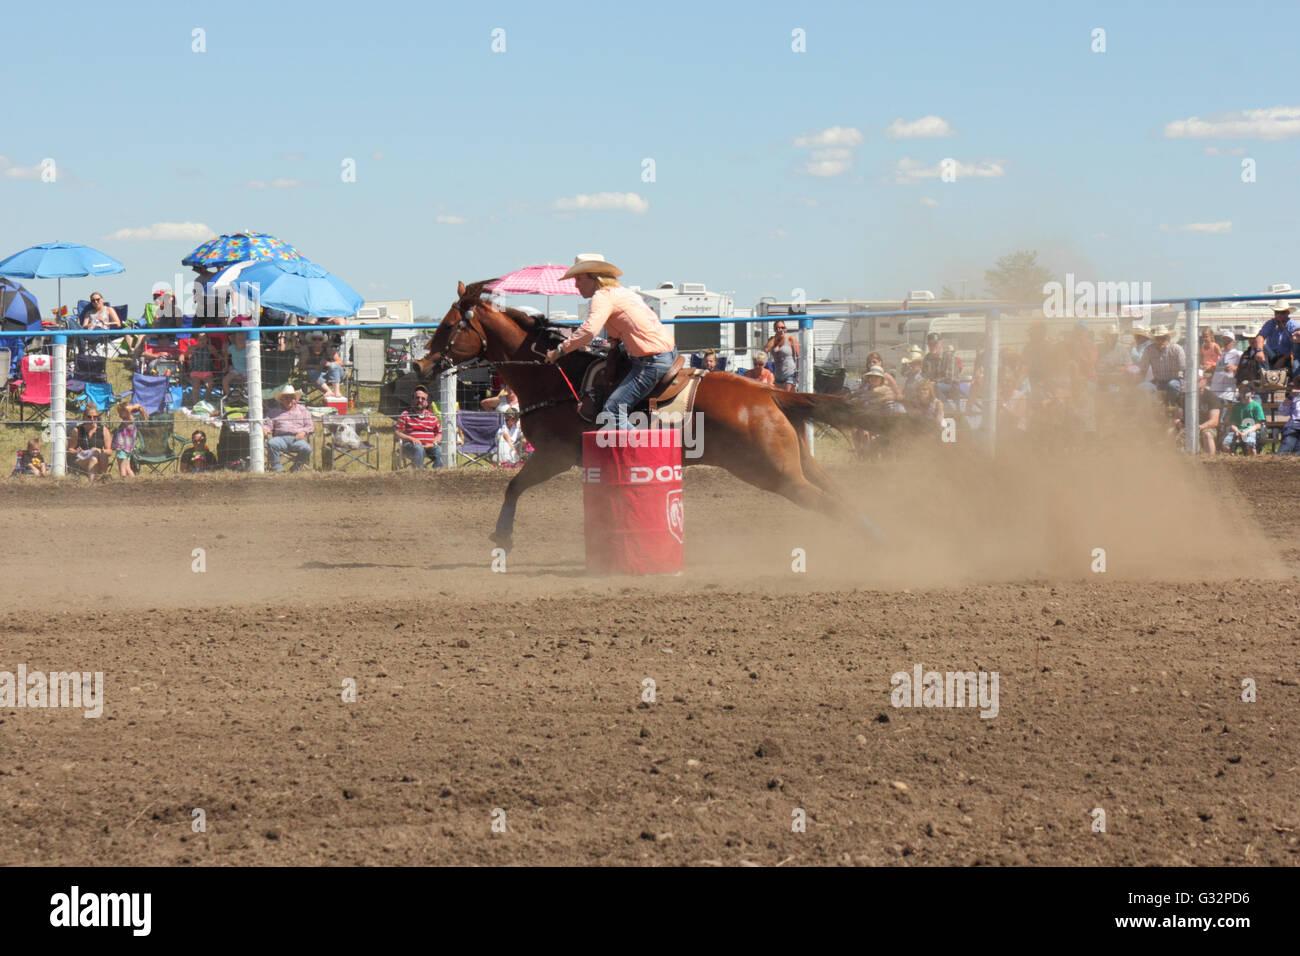 Barrel racing in a rodeo in Alberta, Canada - Stock Image